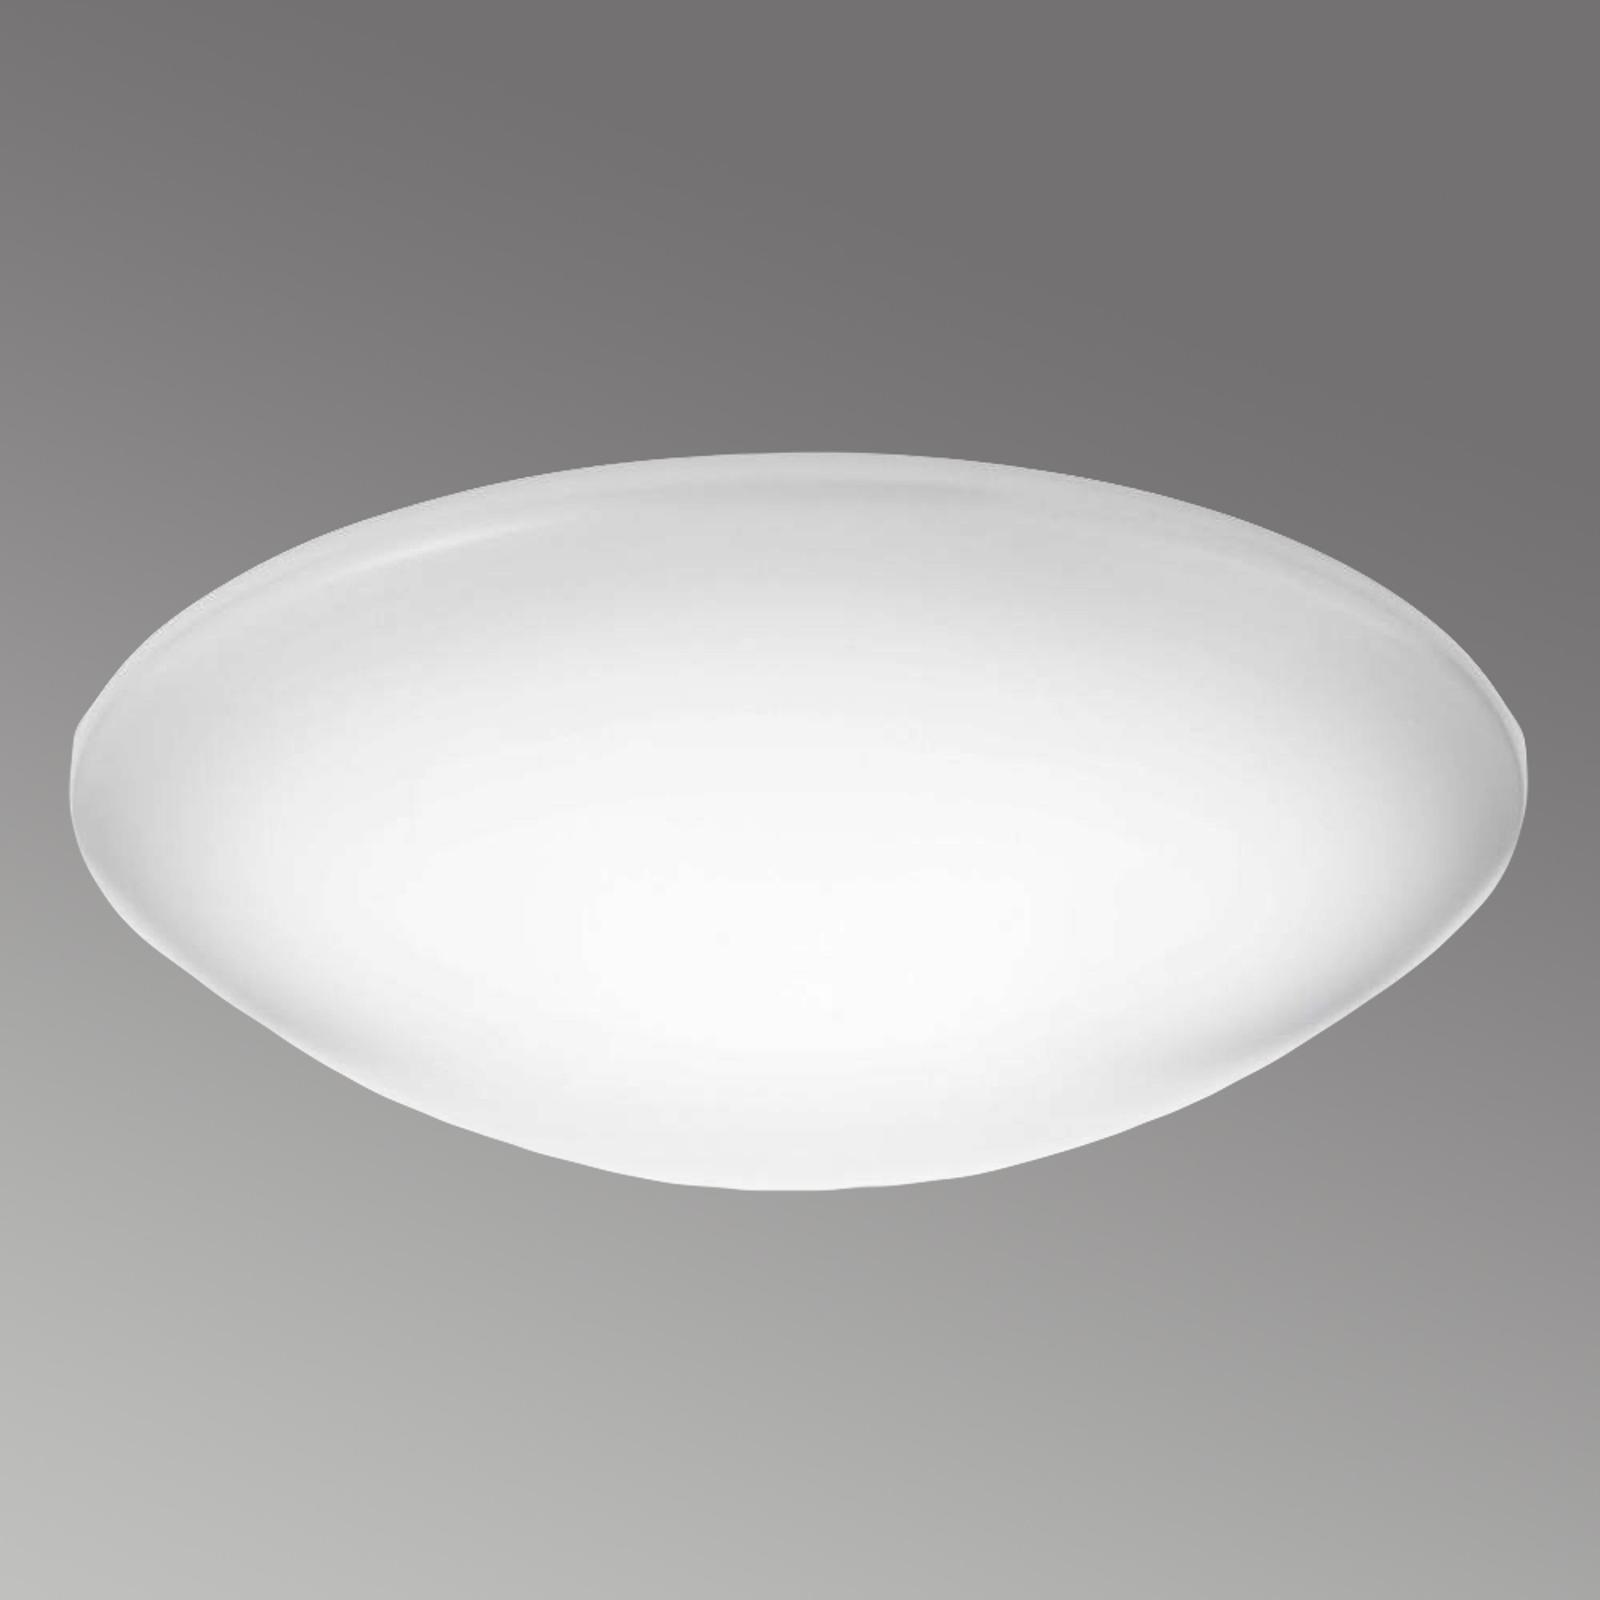 Suuri muovinen Suede-LED-kattovalaisin